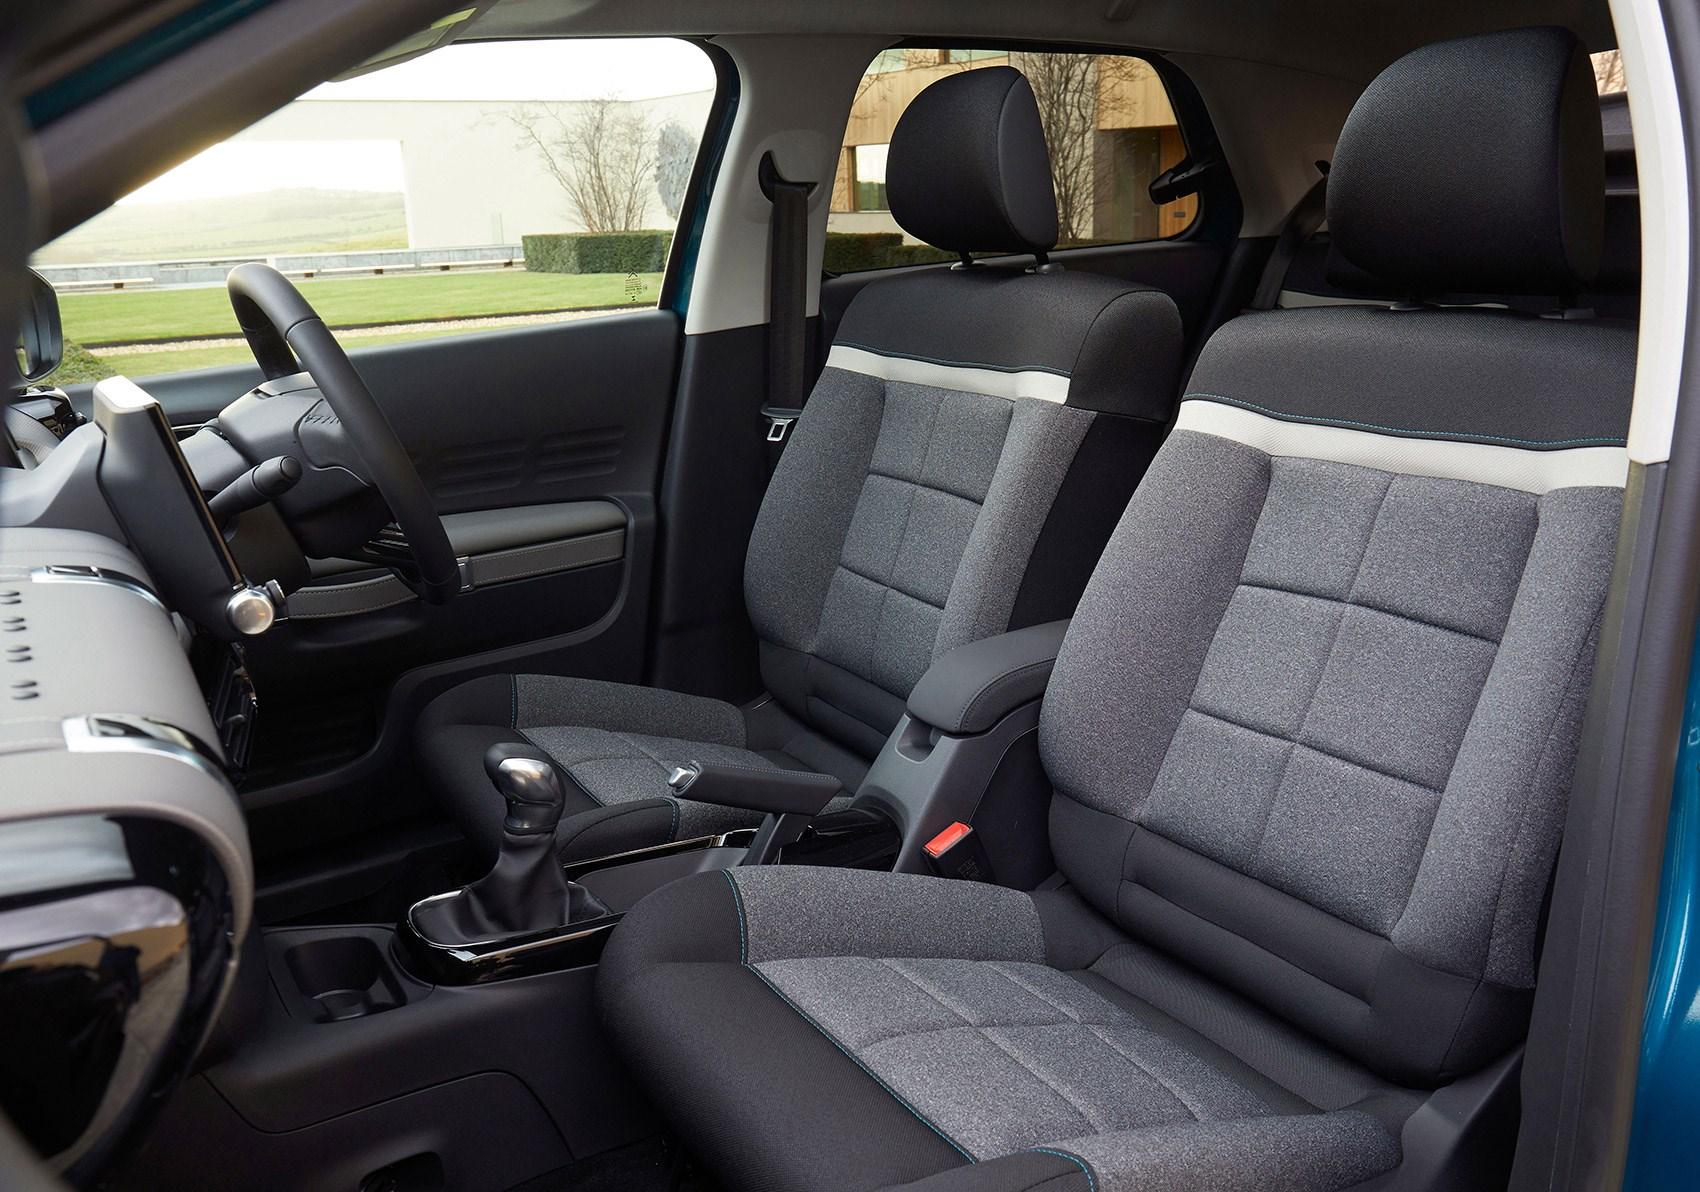 Citroen Comfort Seats